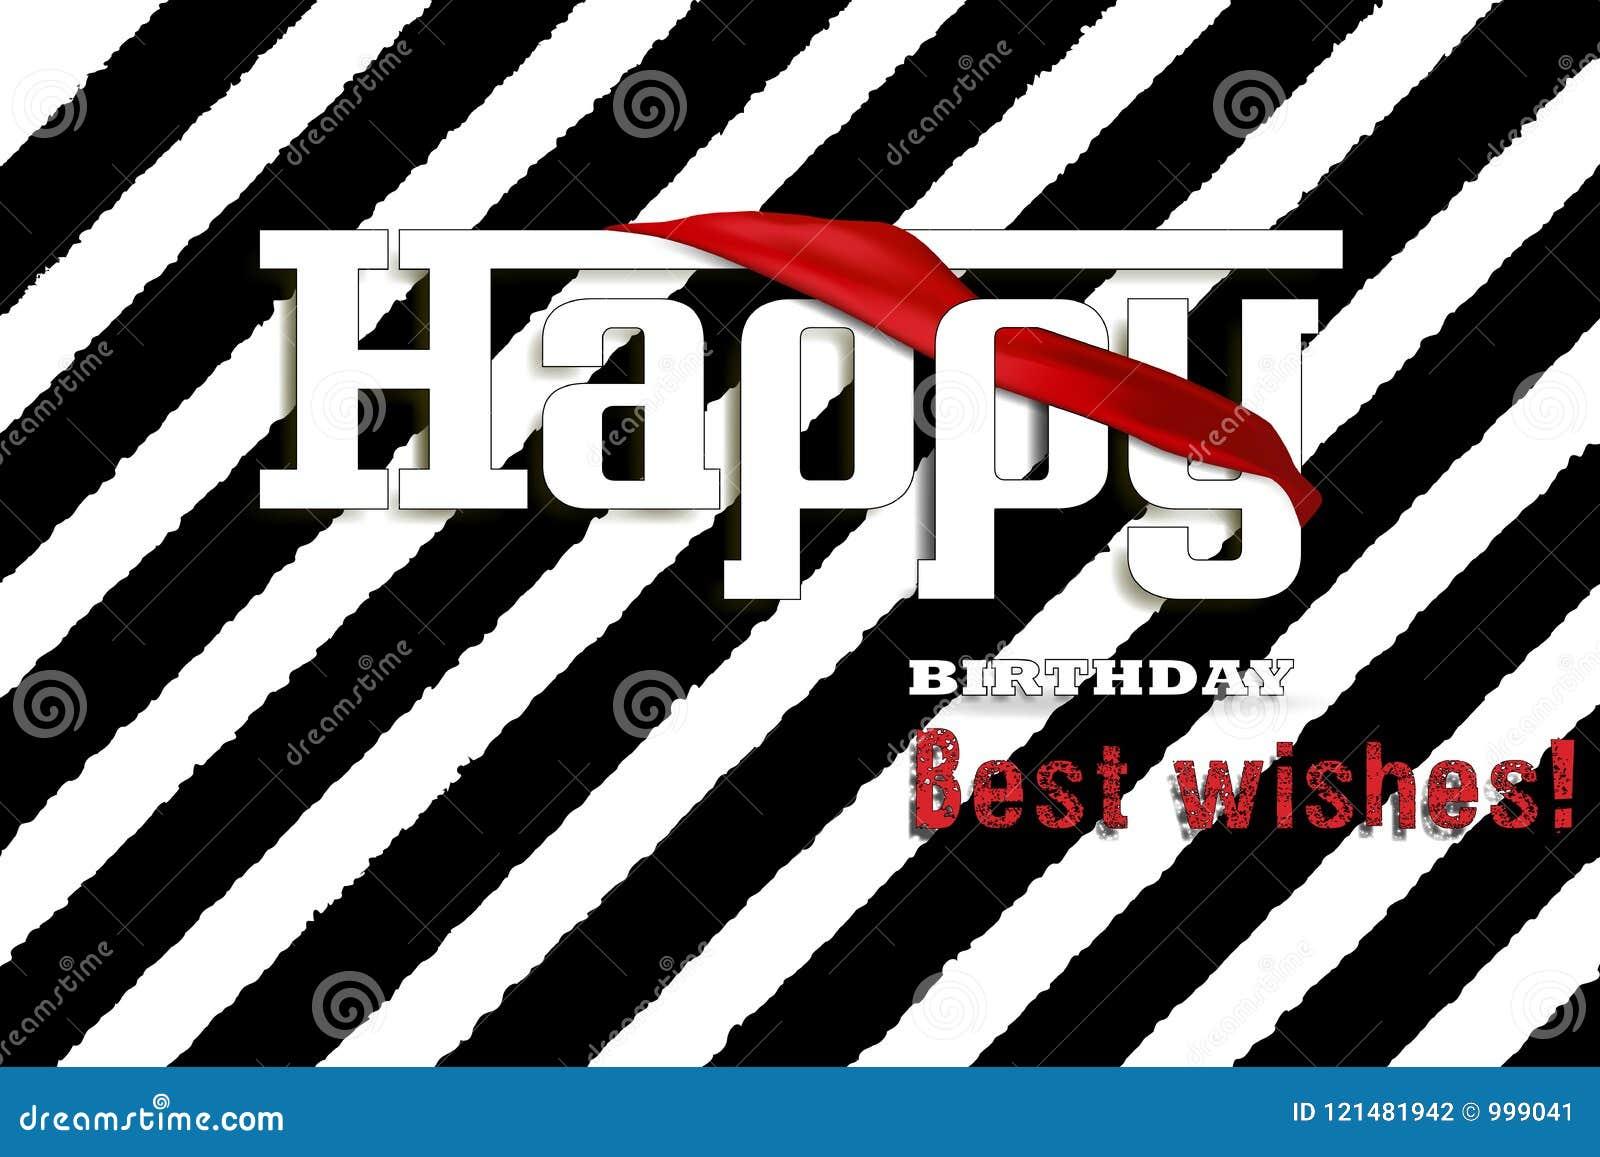 Happy Birthday Letters Card Illustration Stock Vector Illustration